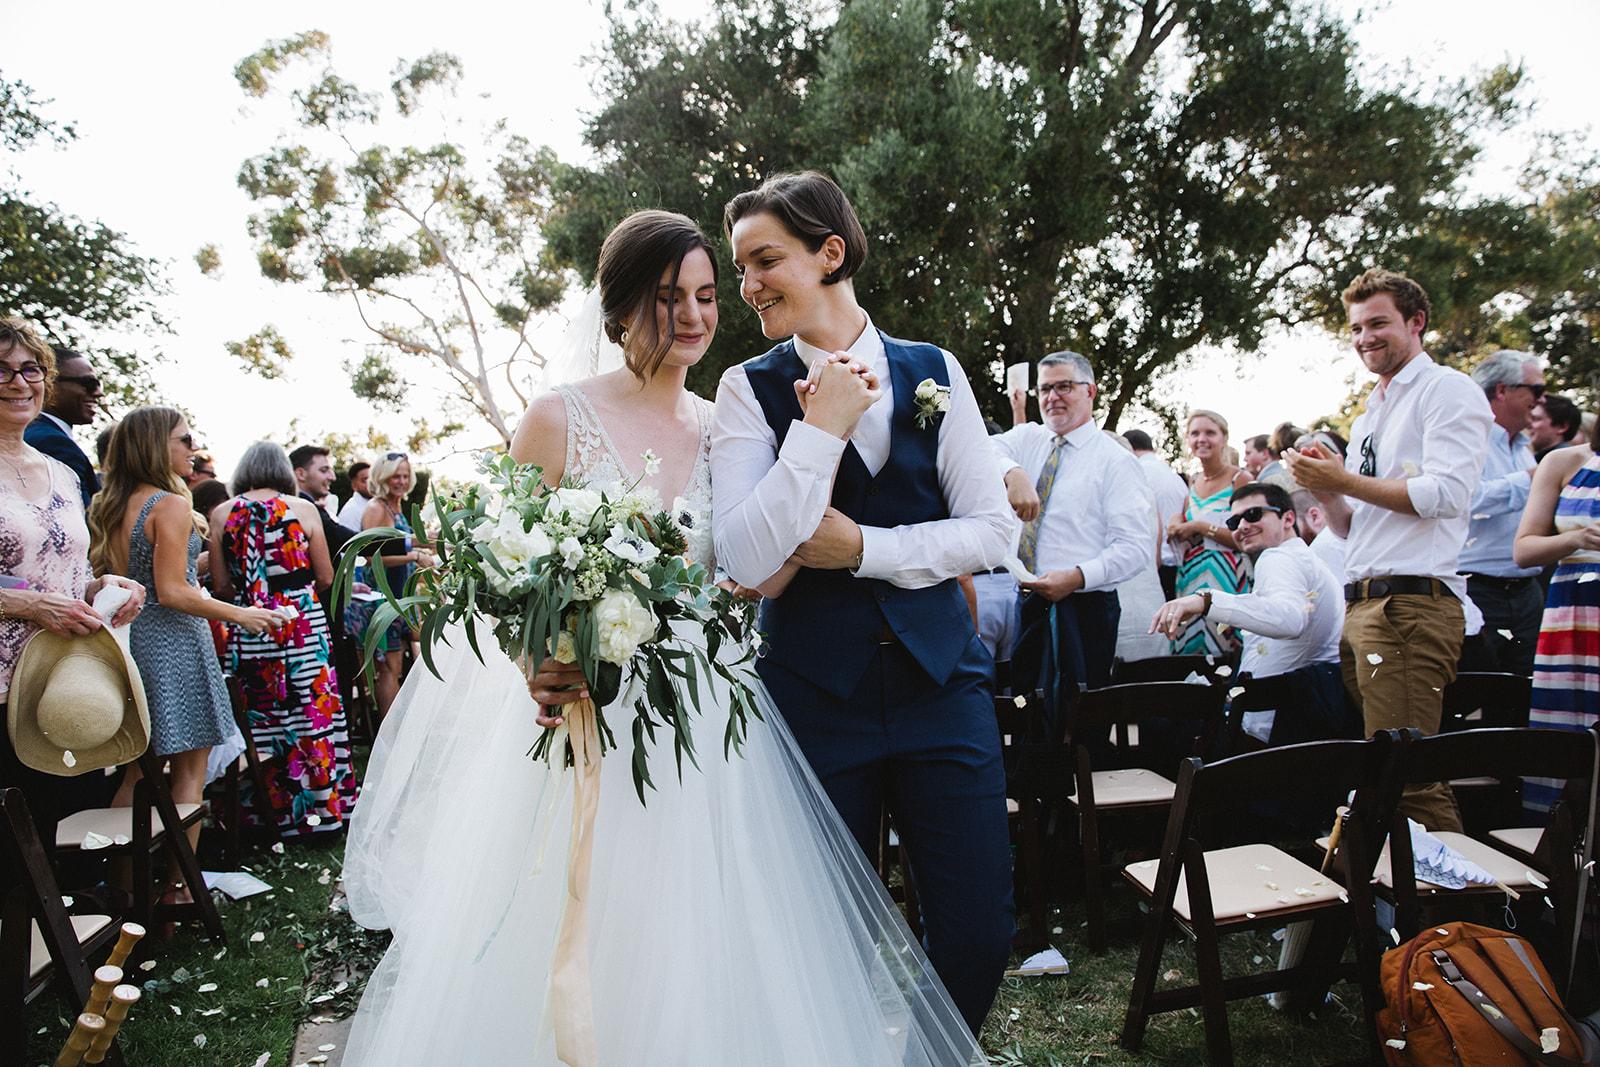 grace_elizabeth_wedding066.jpg